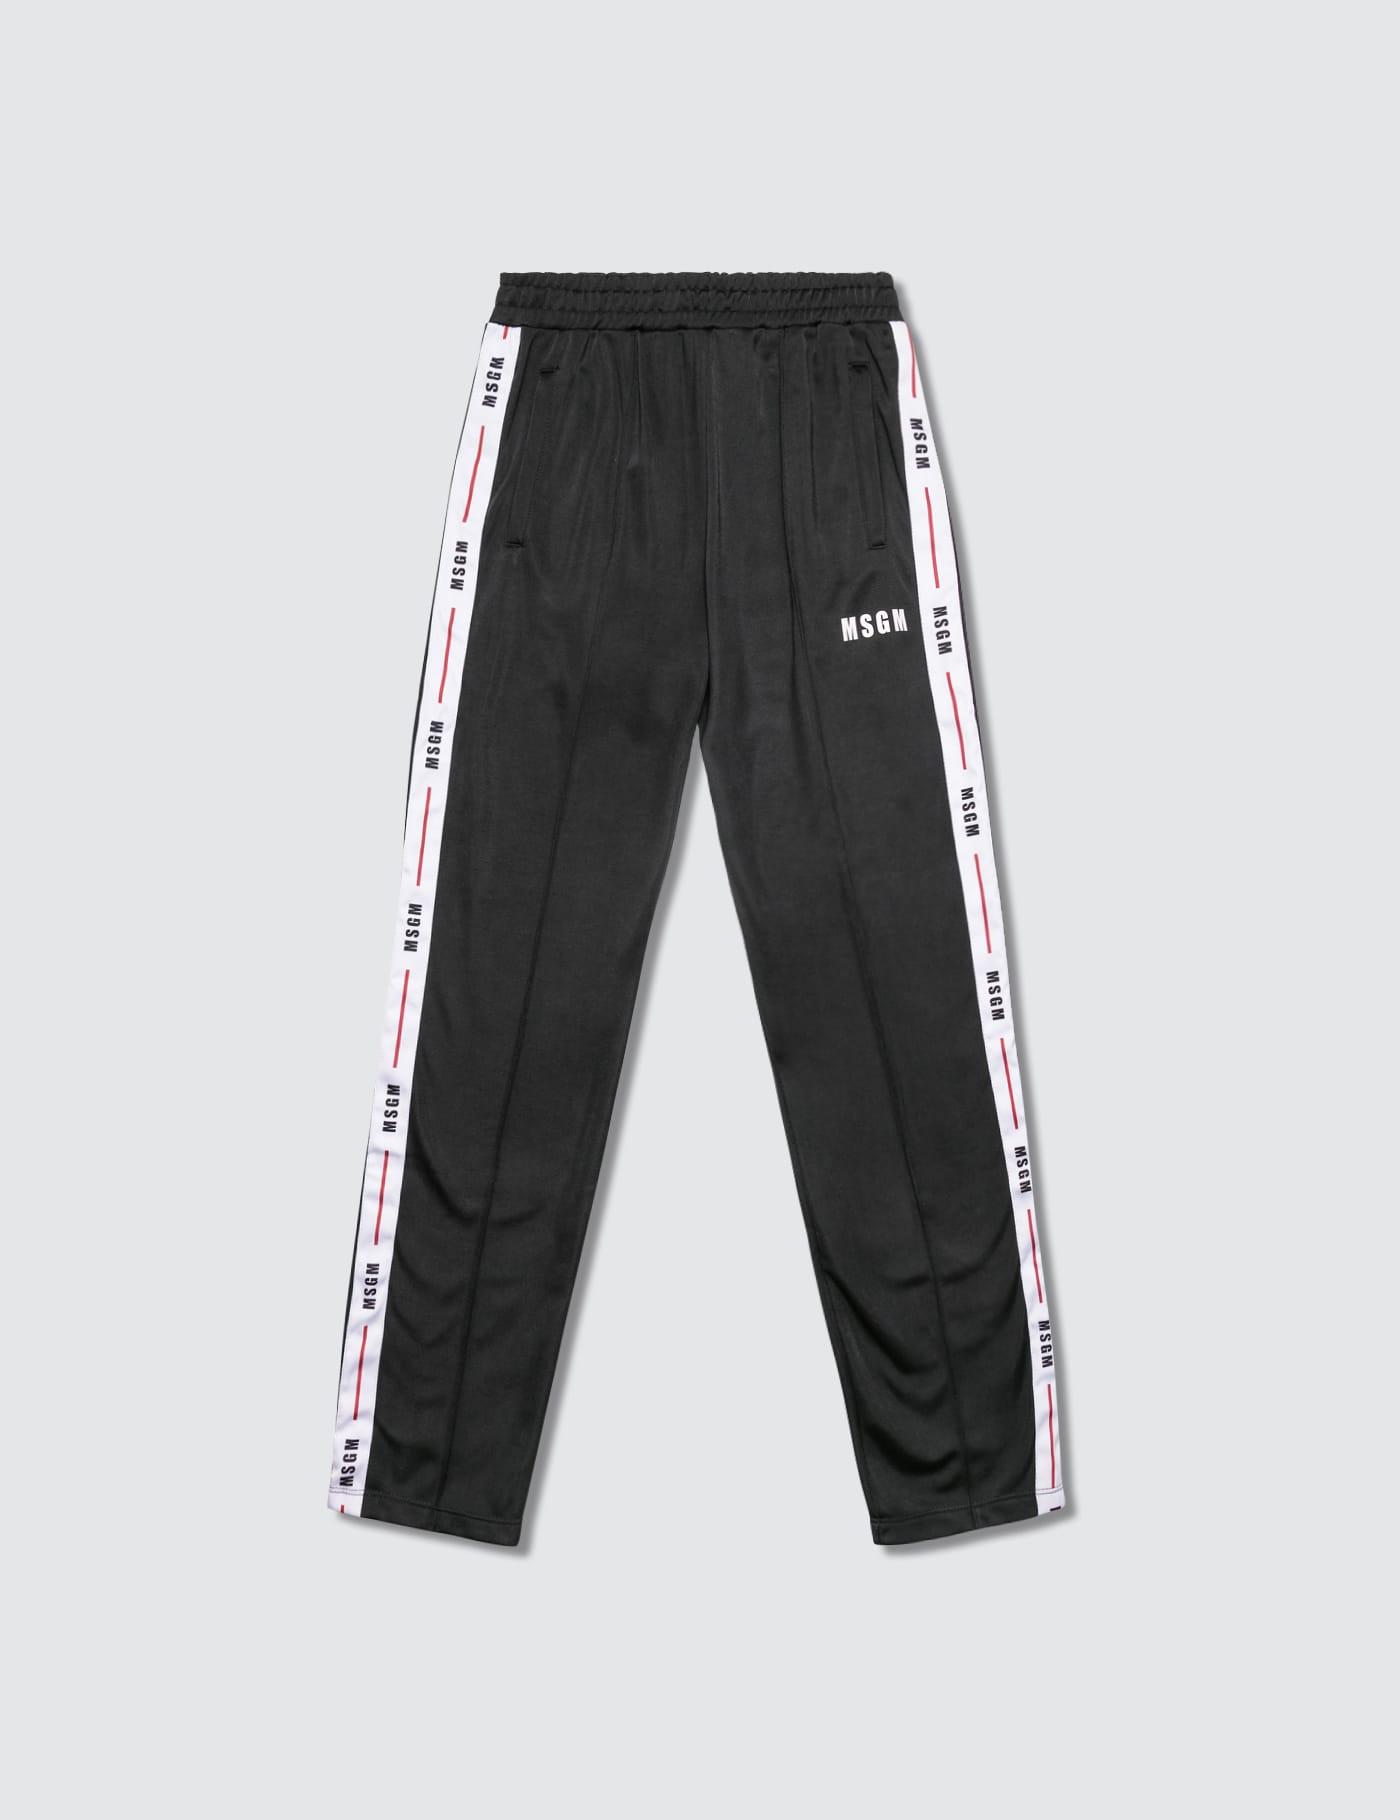 Pantaloni Triacetato Unisex